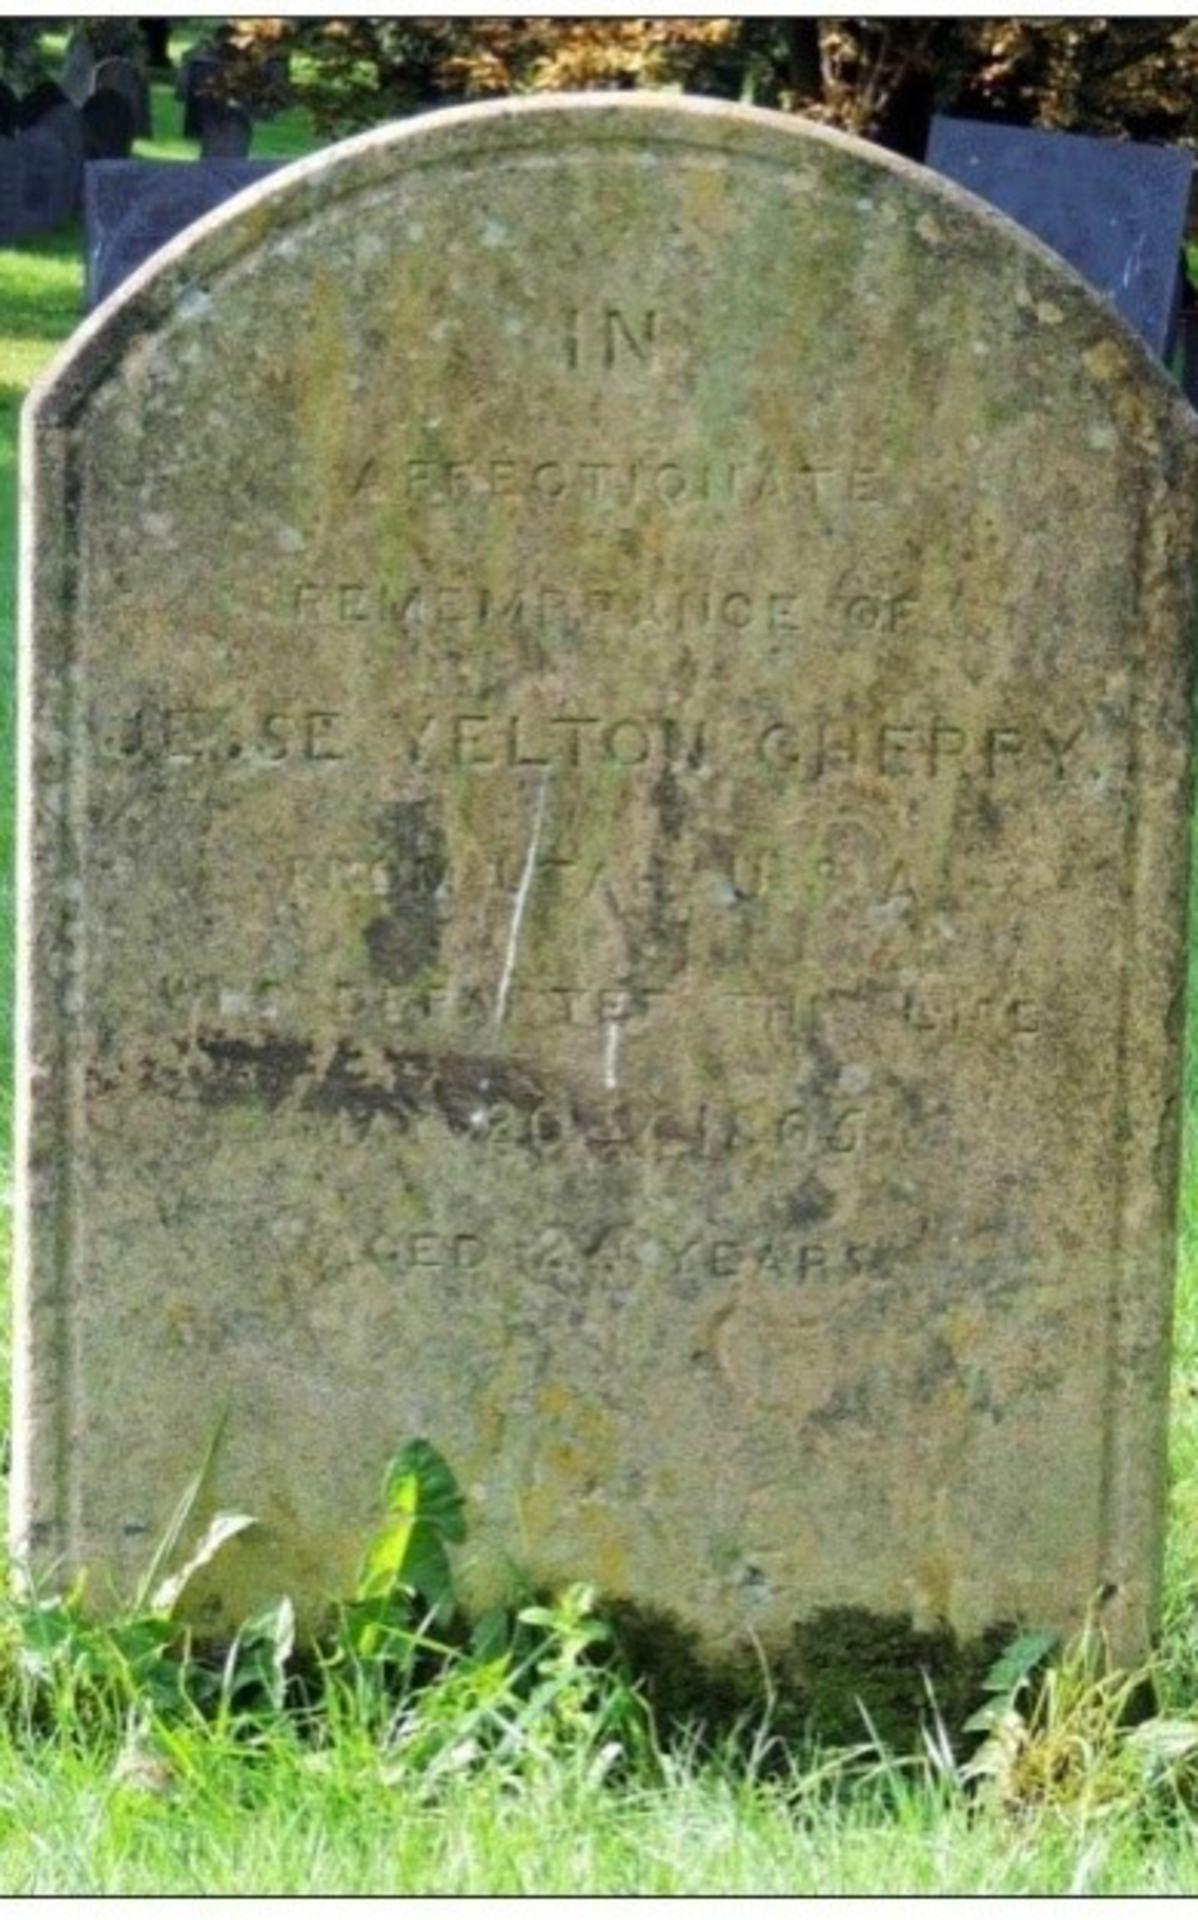 Stone of Jesse Yelton Cherry